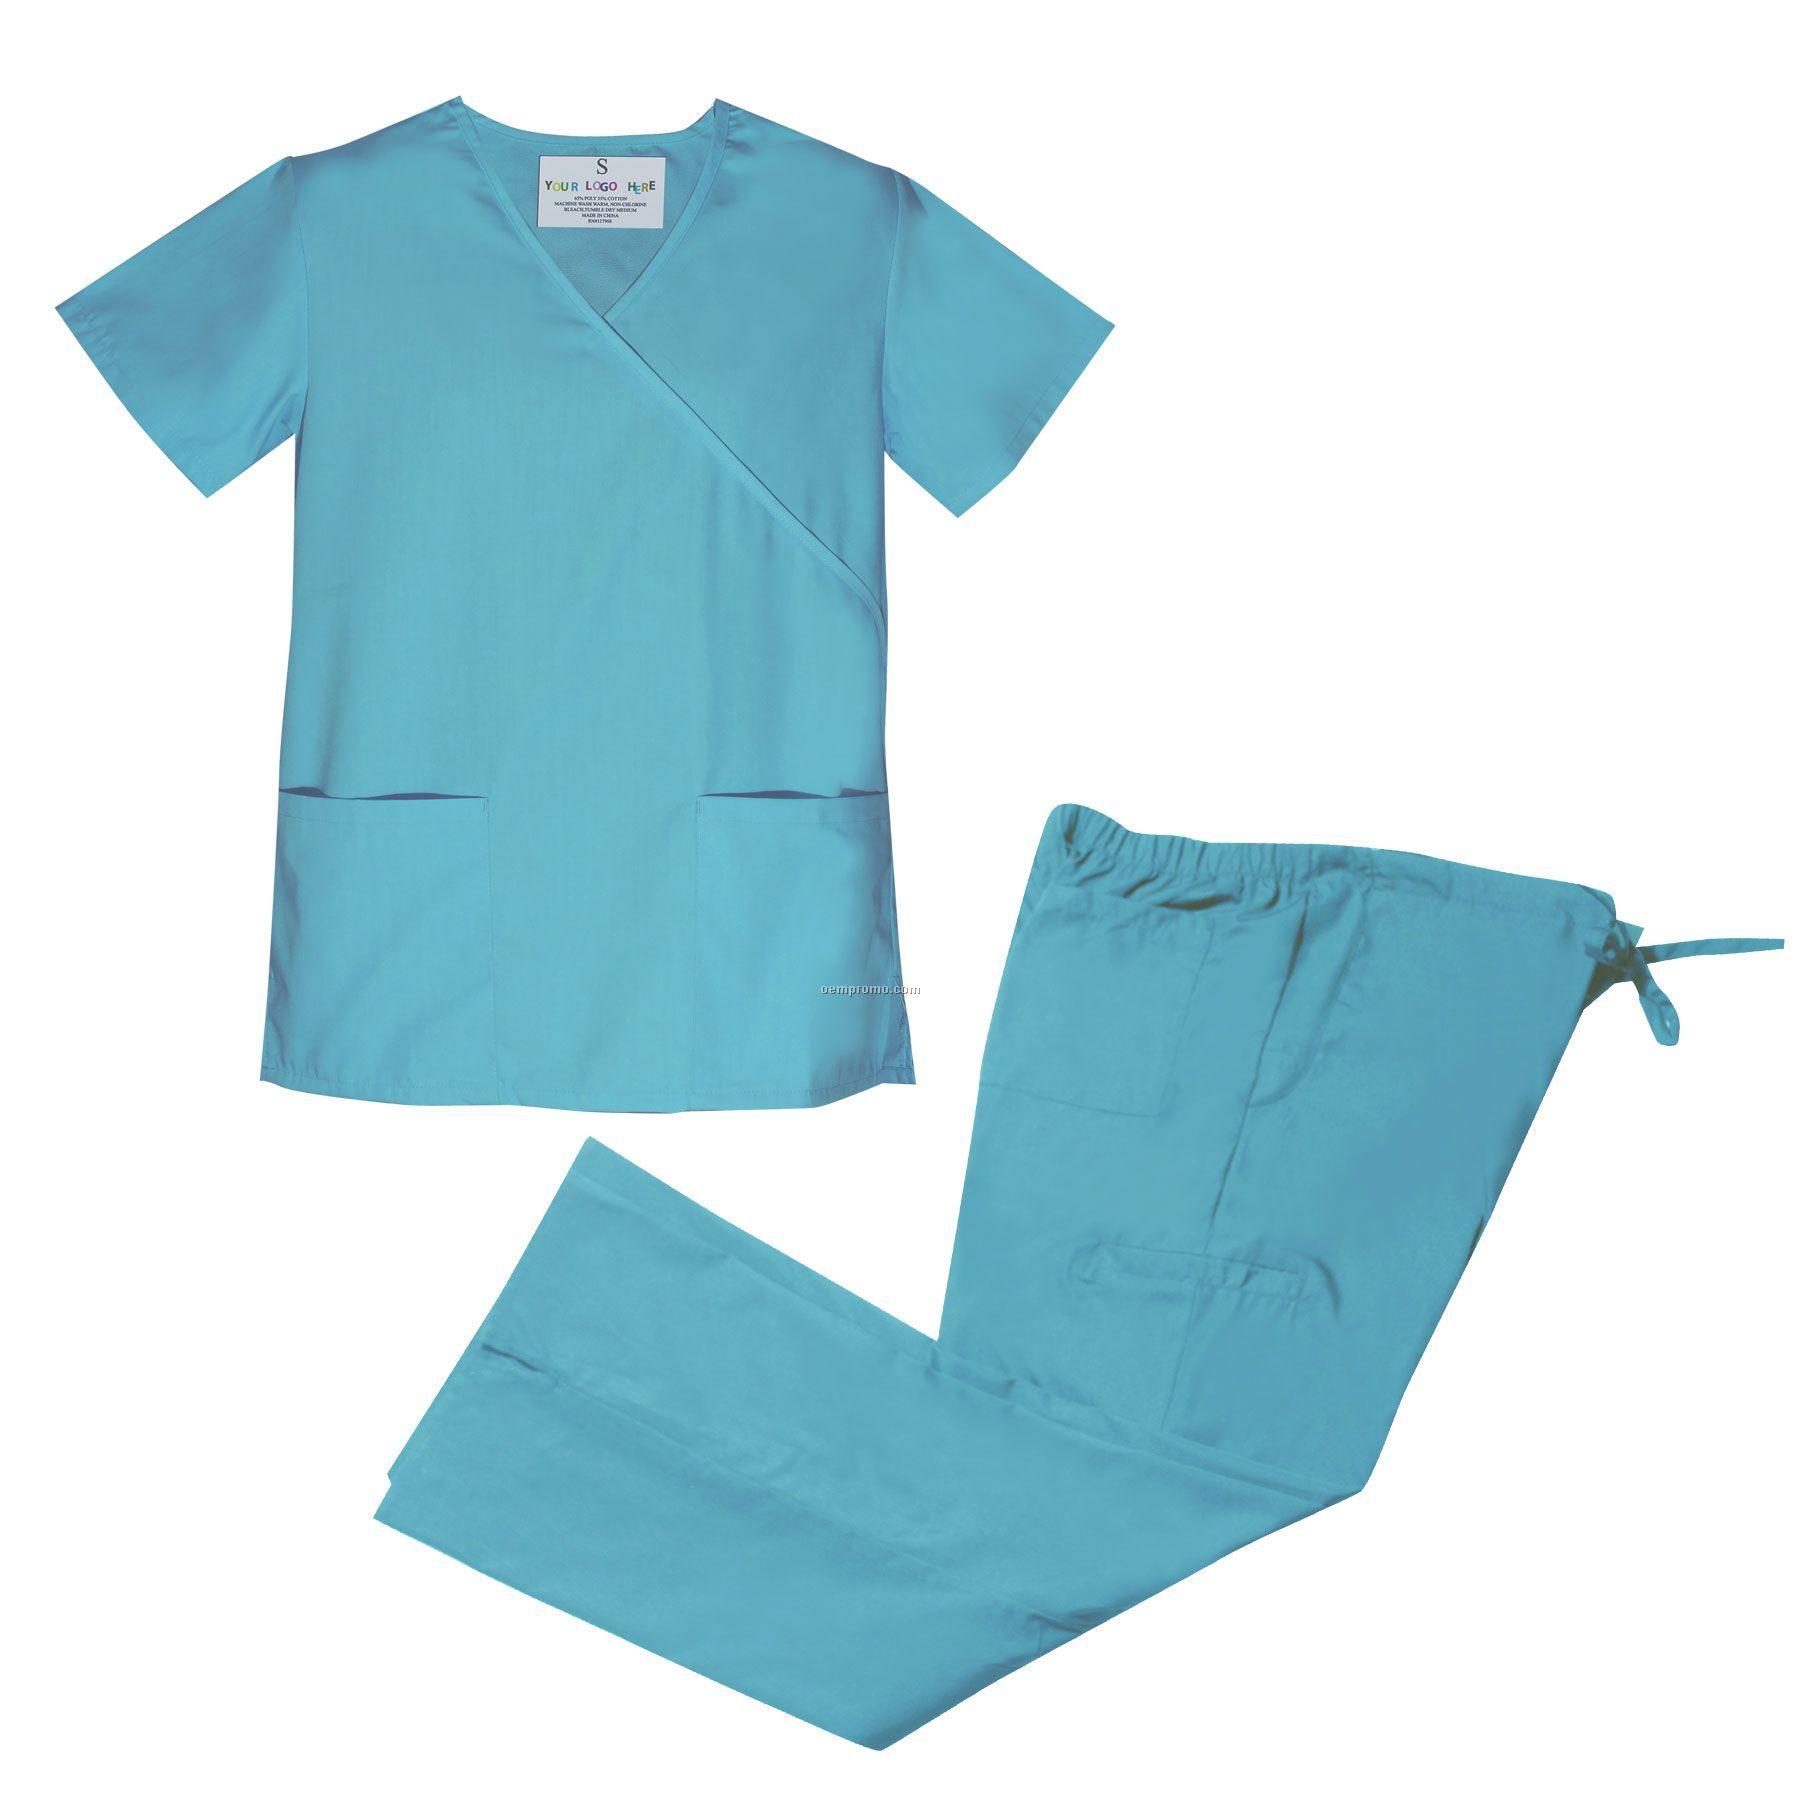 Medical scrubs clipart png transparent download Free Scrubs Pants Cliparts, Download Free Clip Art, Free Clip Art on ... png transparent download